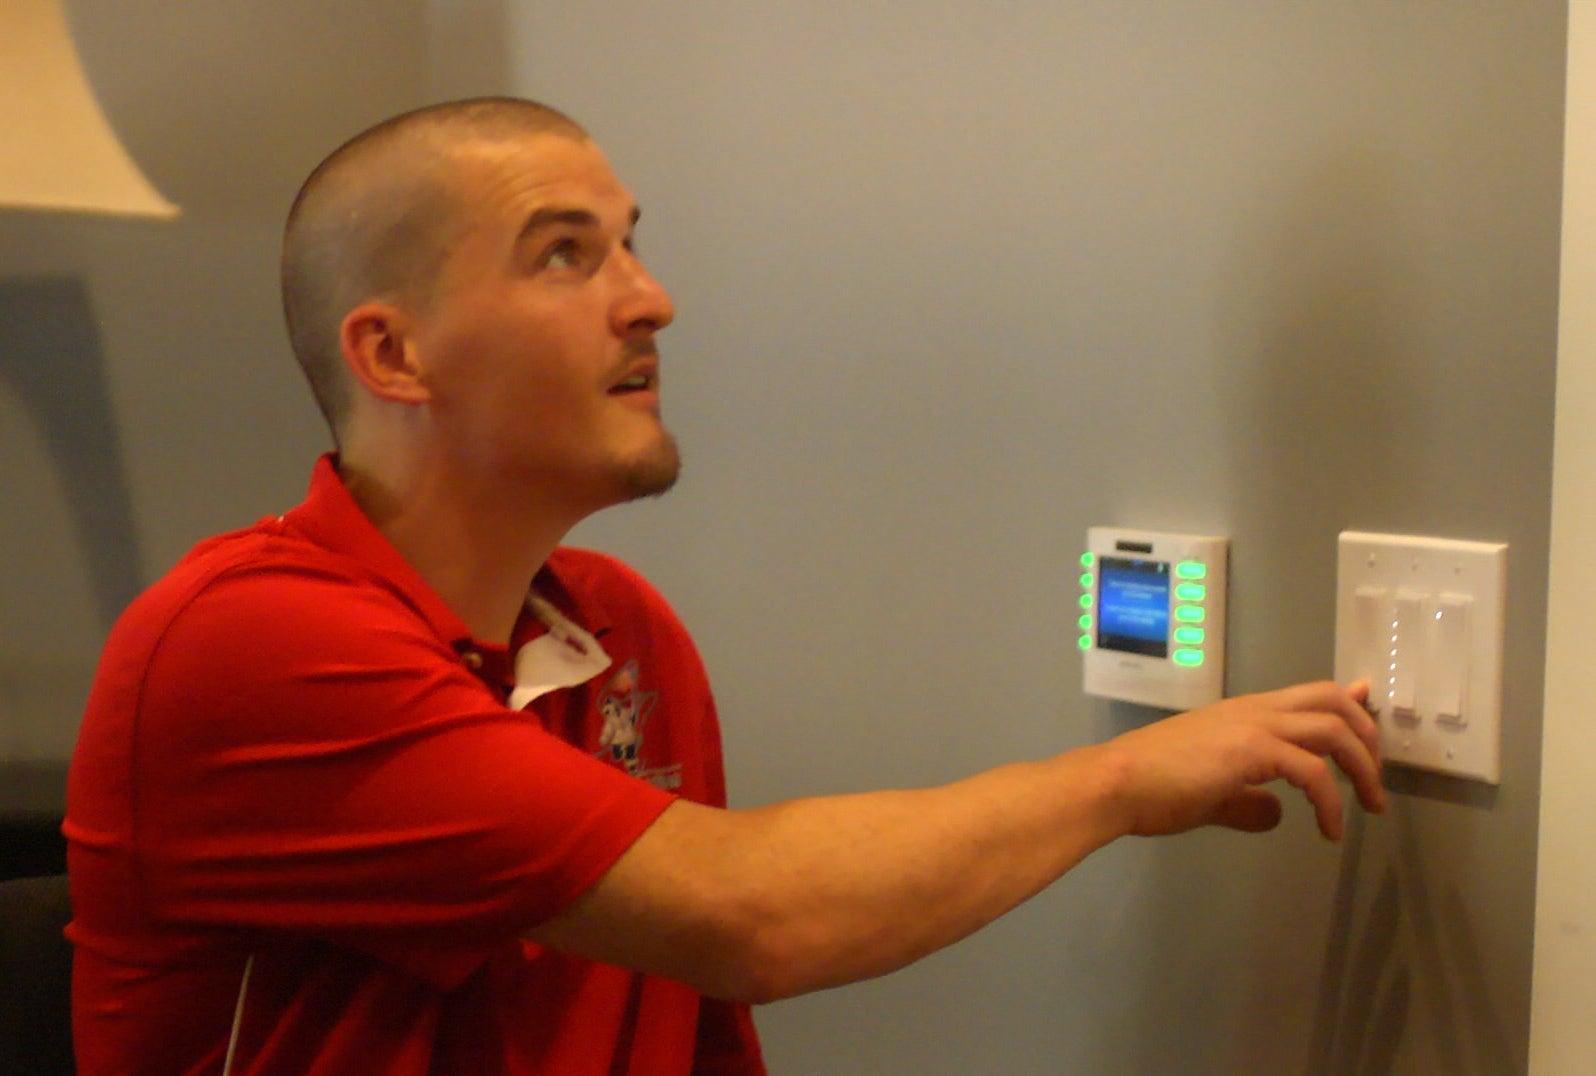 Sensor controlled lighting system